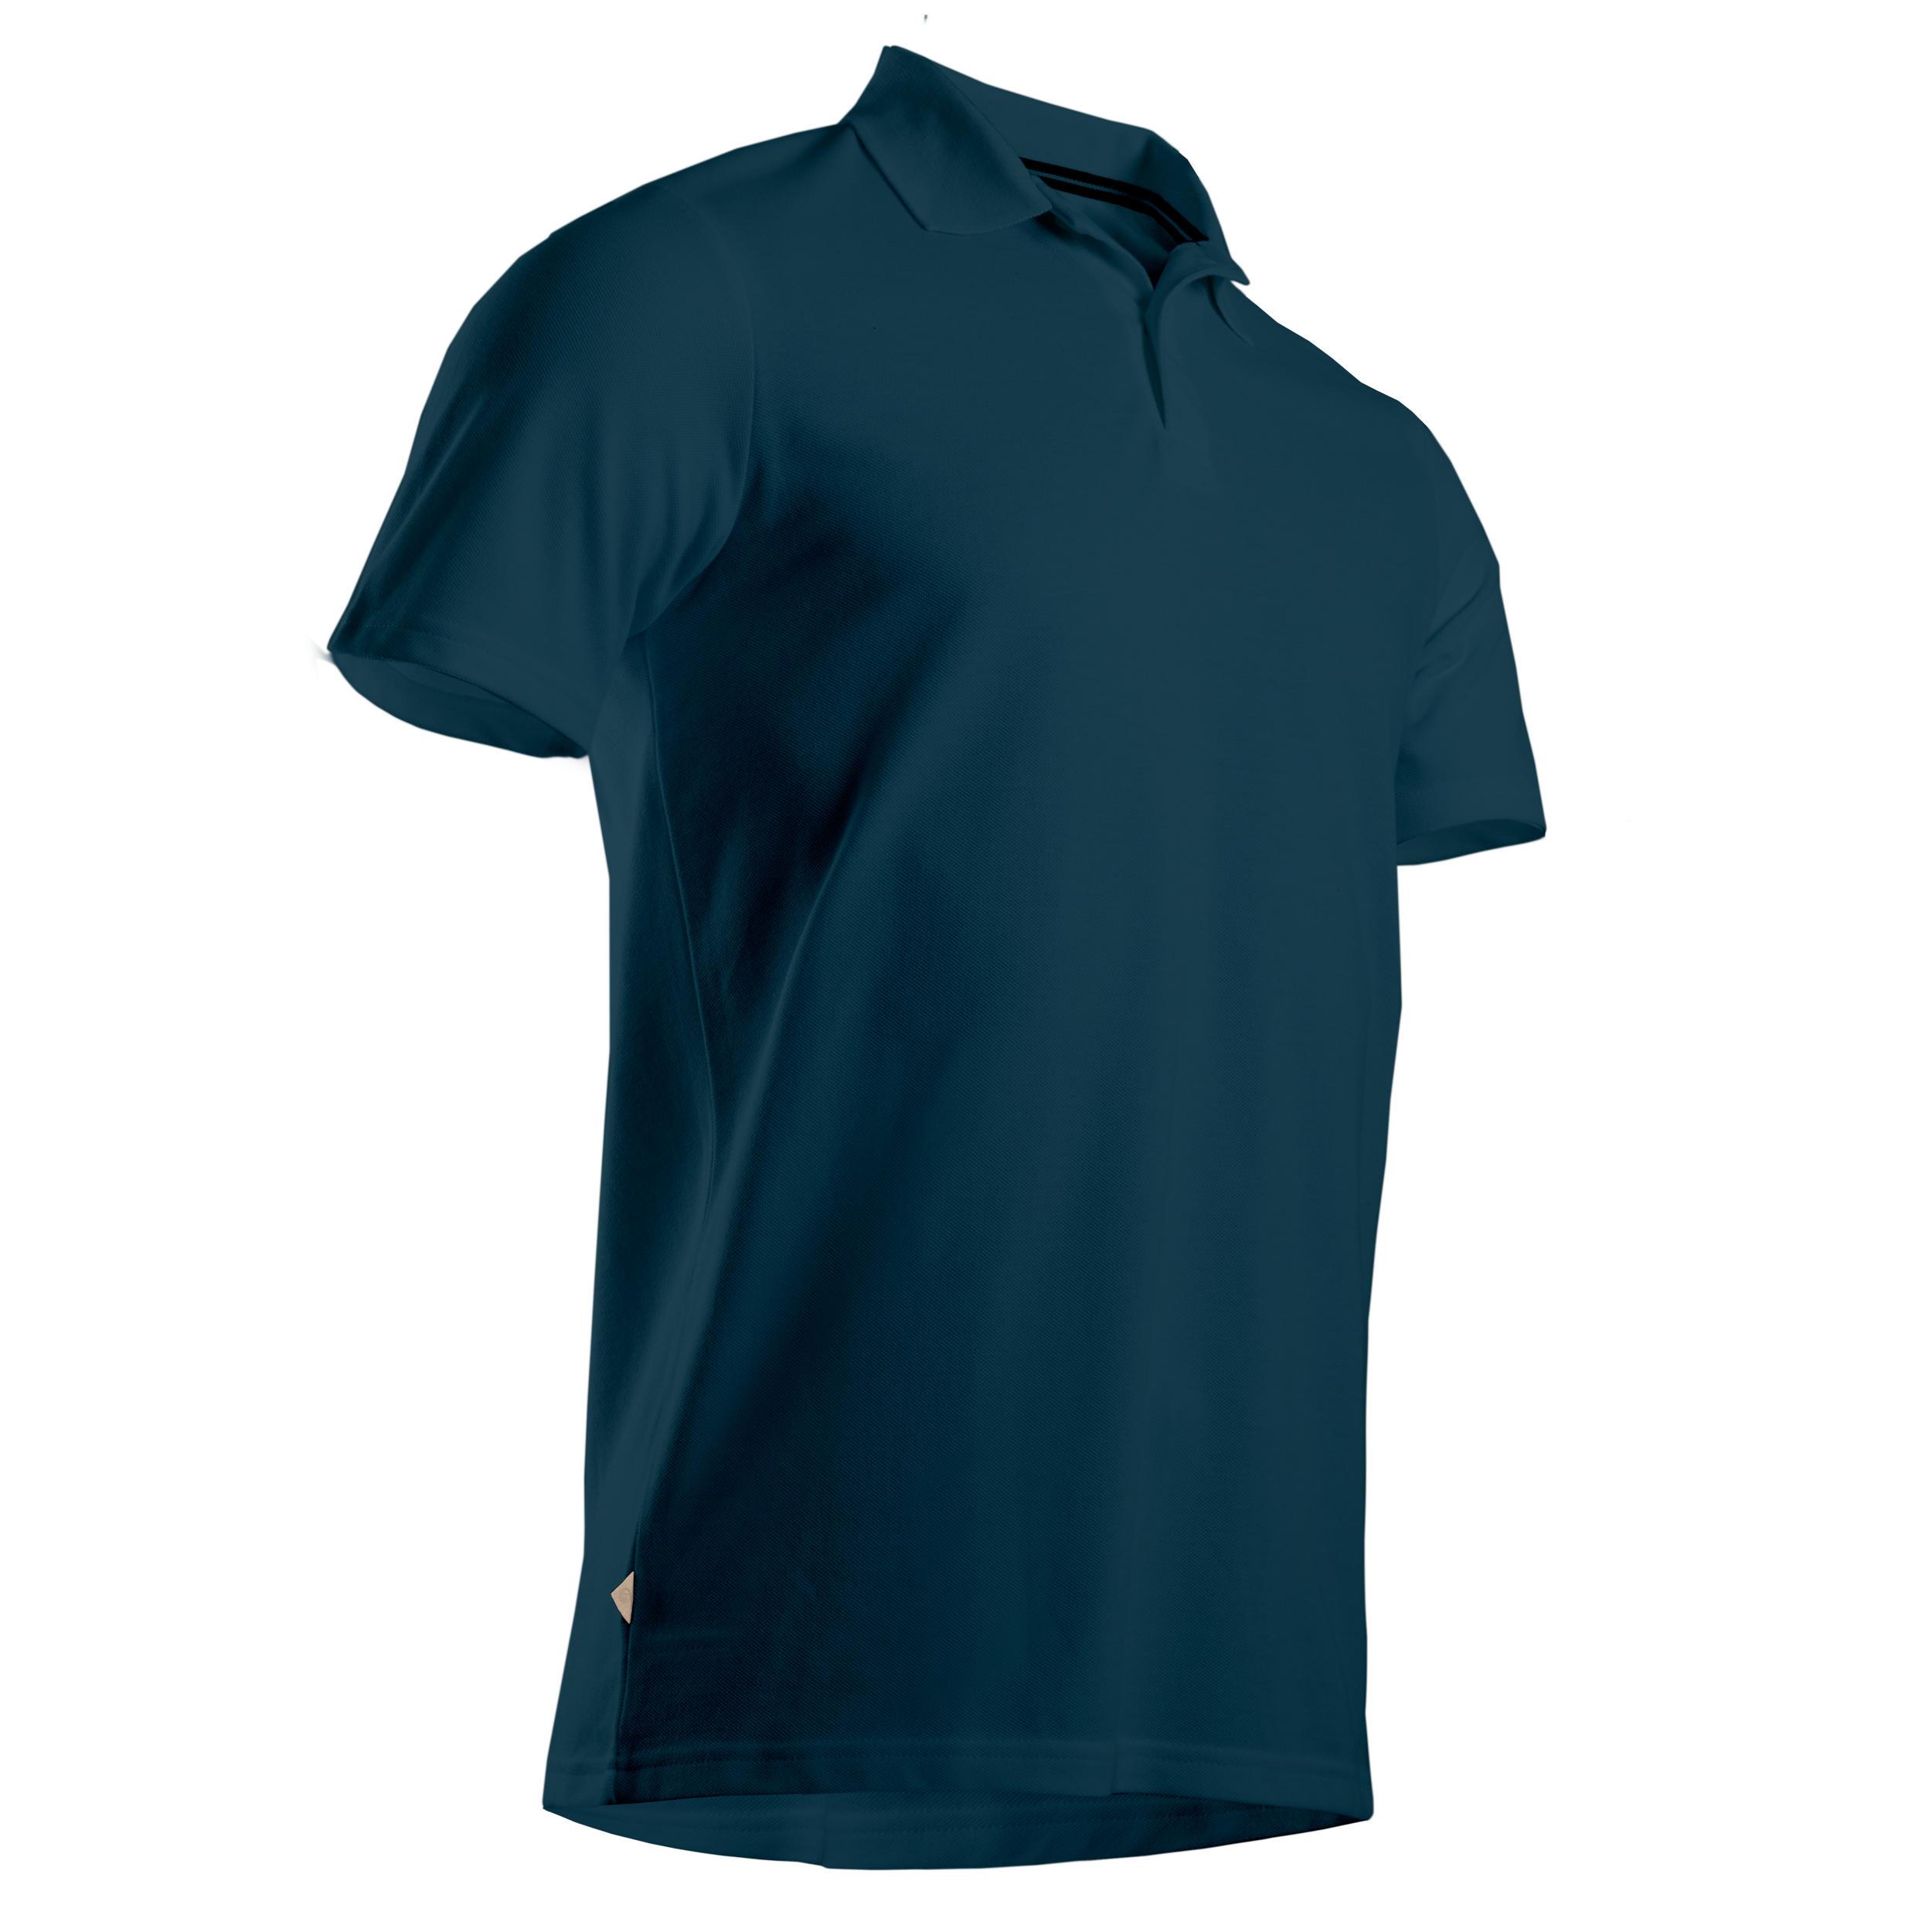 Tricou POLO bleumarin bărbați la Reducere poza